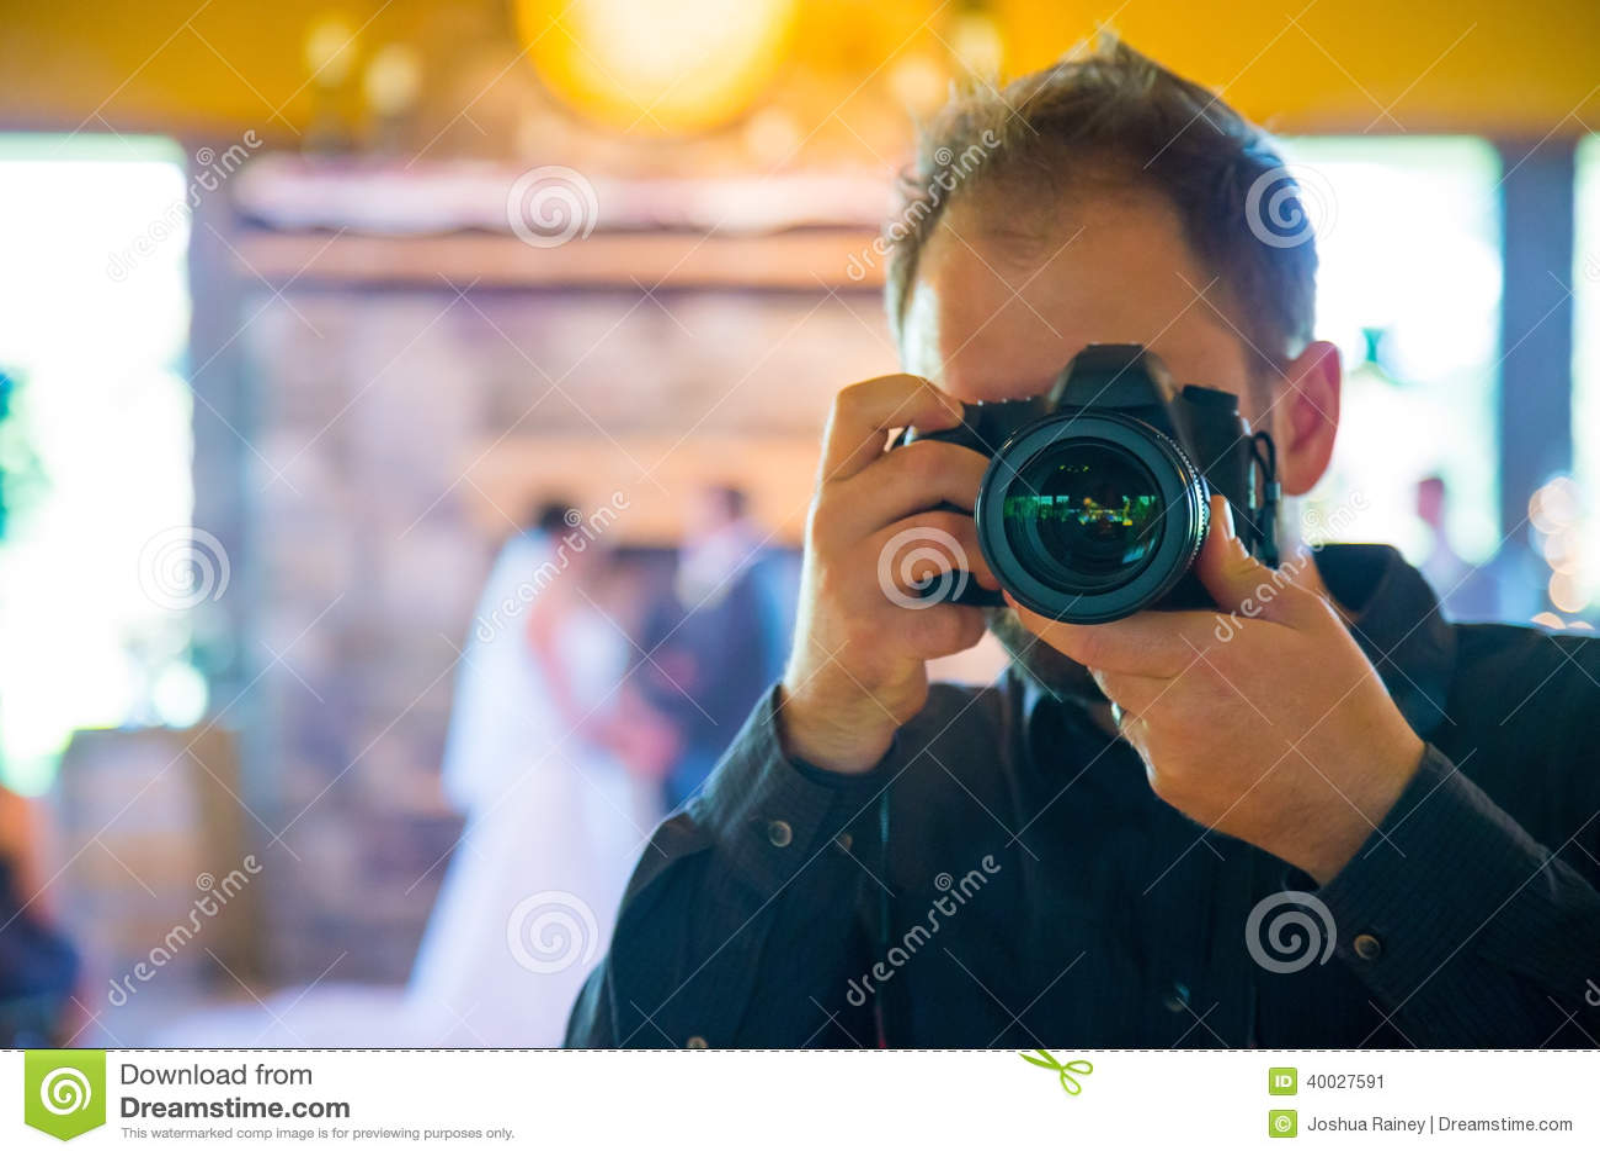 stock image wedding photographer self portrait dslr professional lens shooting photos bride groom ce